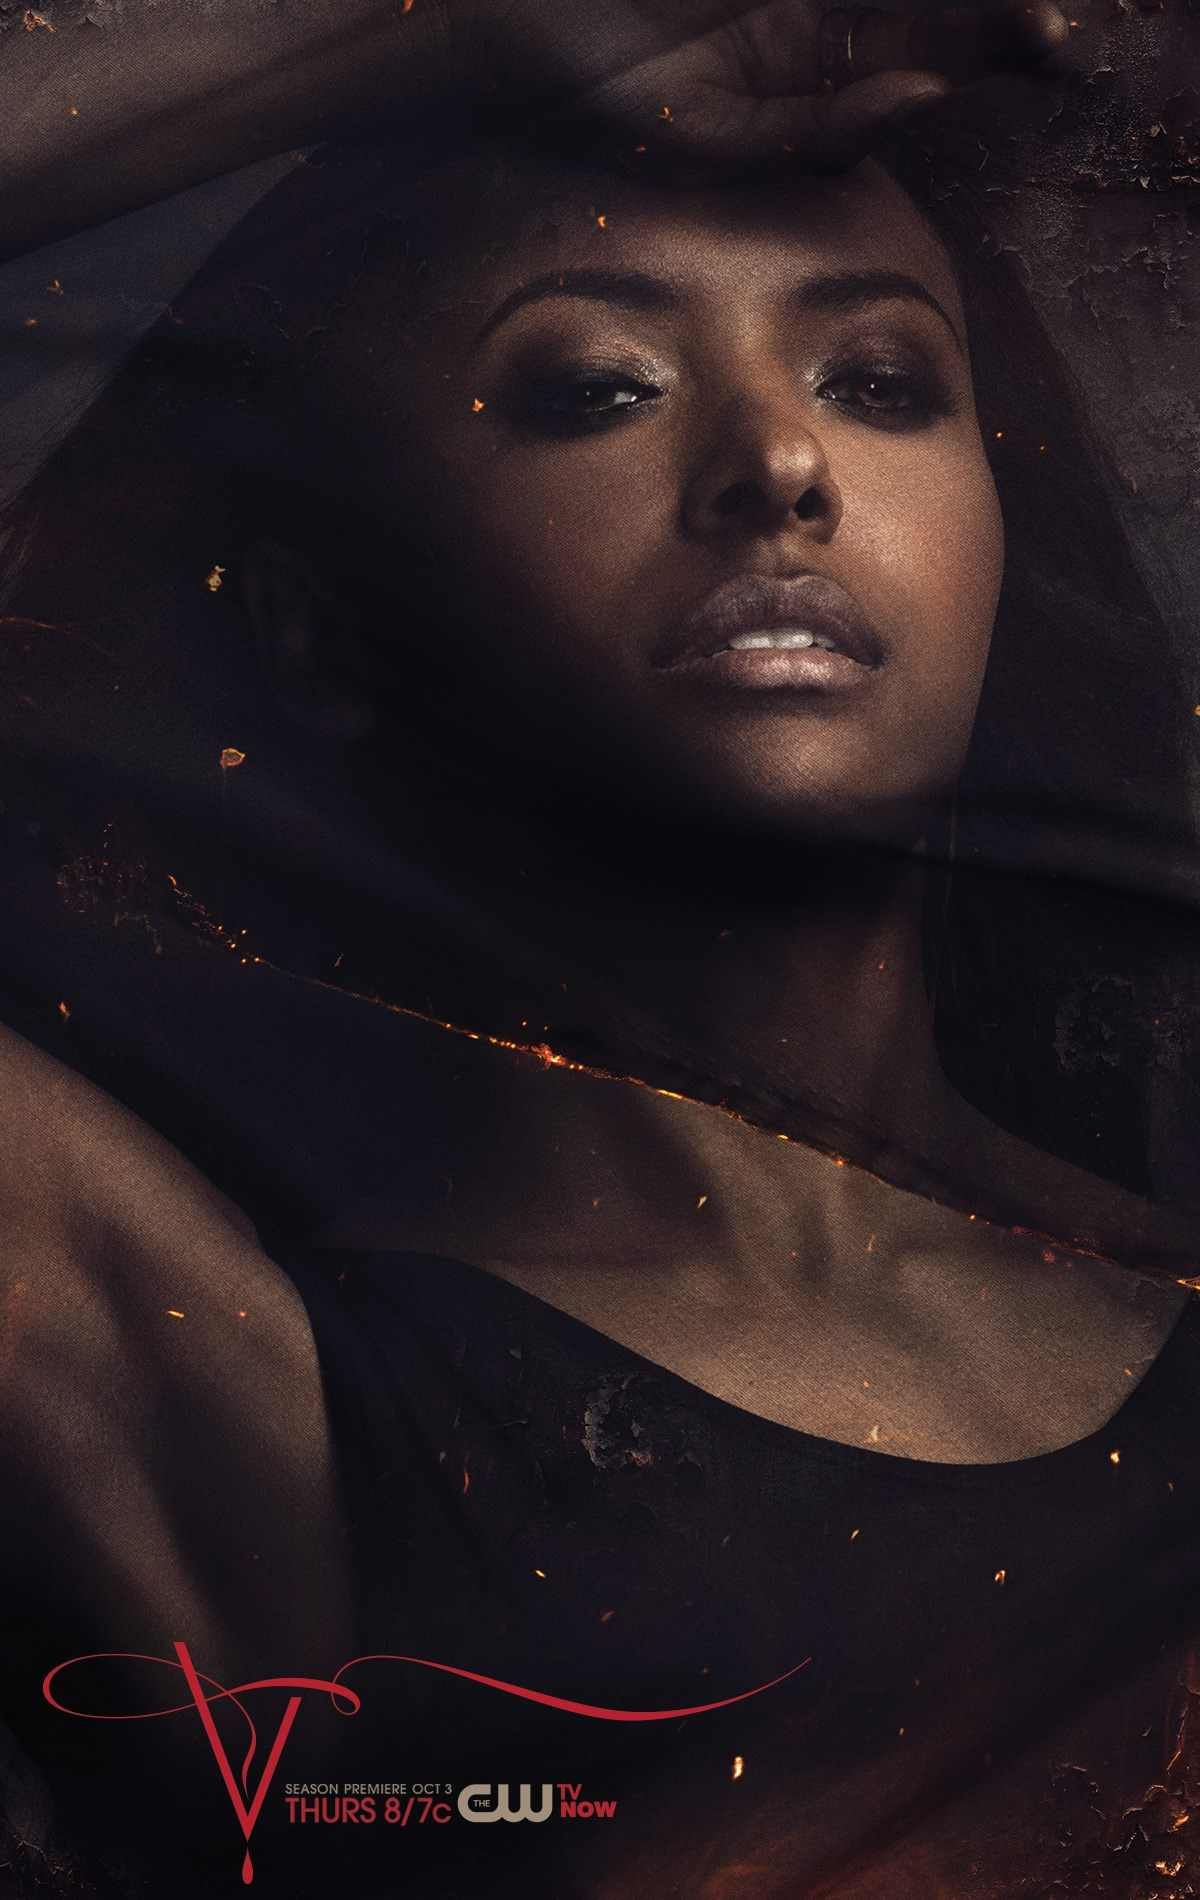 The Vampire Diaries Bonnie Season 5 Character Portrait Vampire Diaries Season 5 Vampire Diaries Poster Vampire Diaries Movie